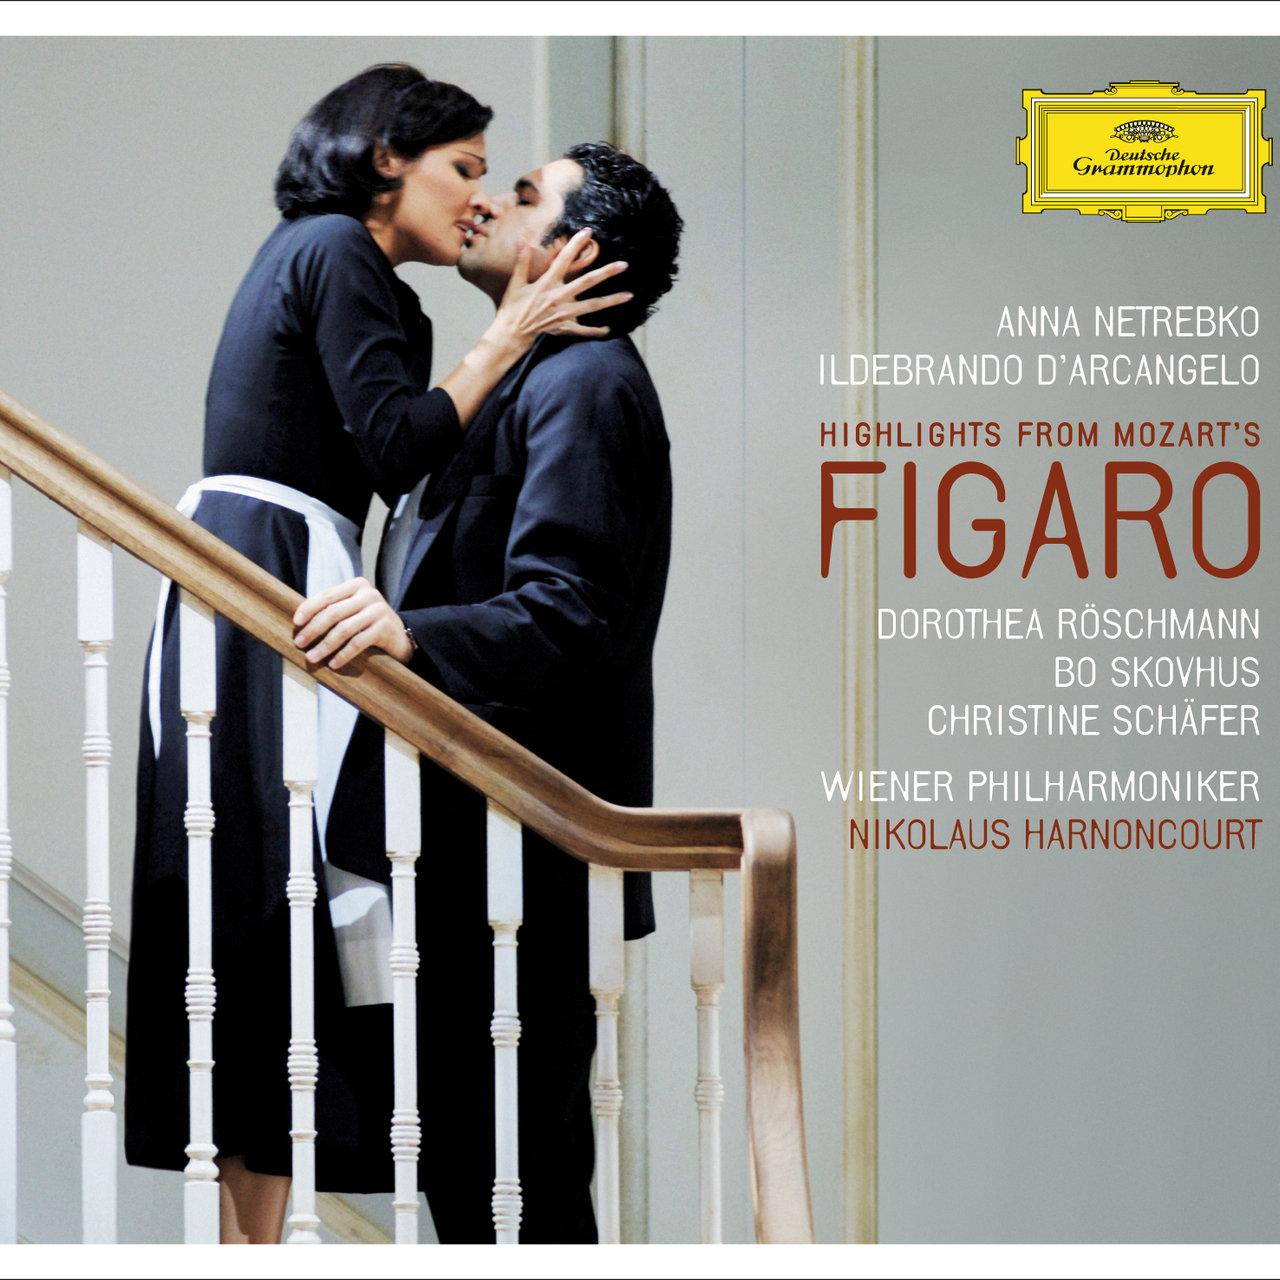 Resultado de imagen para ANNA NETREBKO Figaro - Highlights